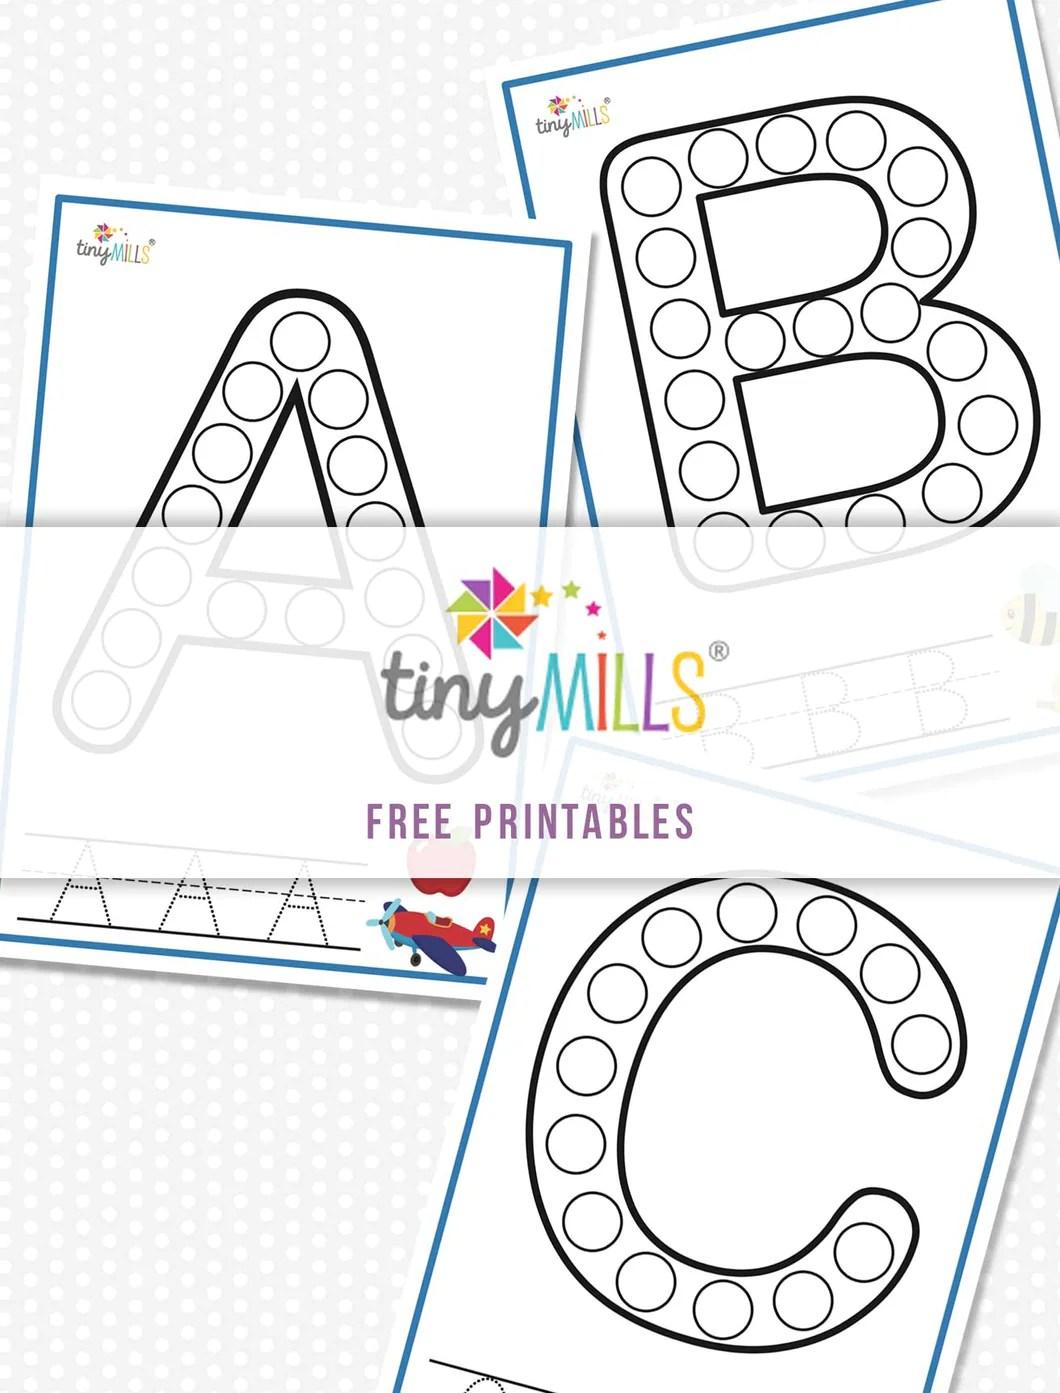 medium resolution of Free Printable Stamp \u0026 Count ABC Worksheet (Full 26 Alphabet) - Tiny Mills®